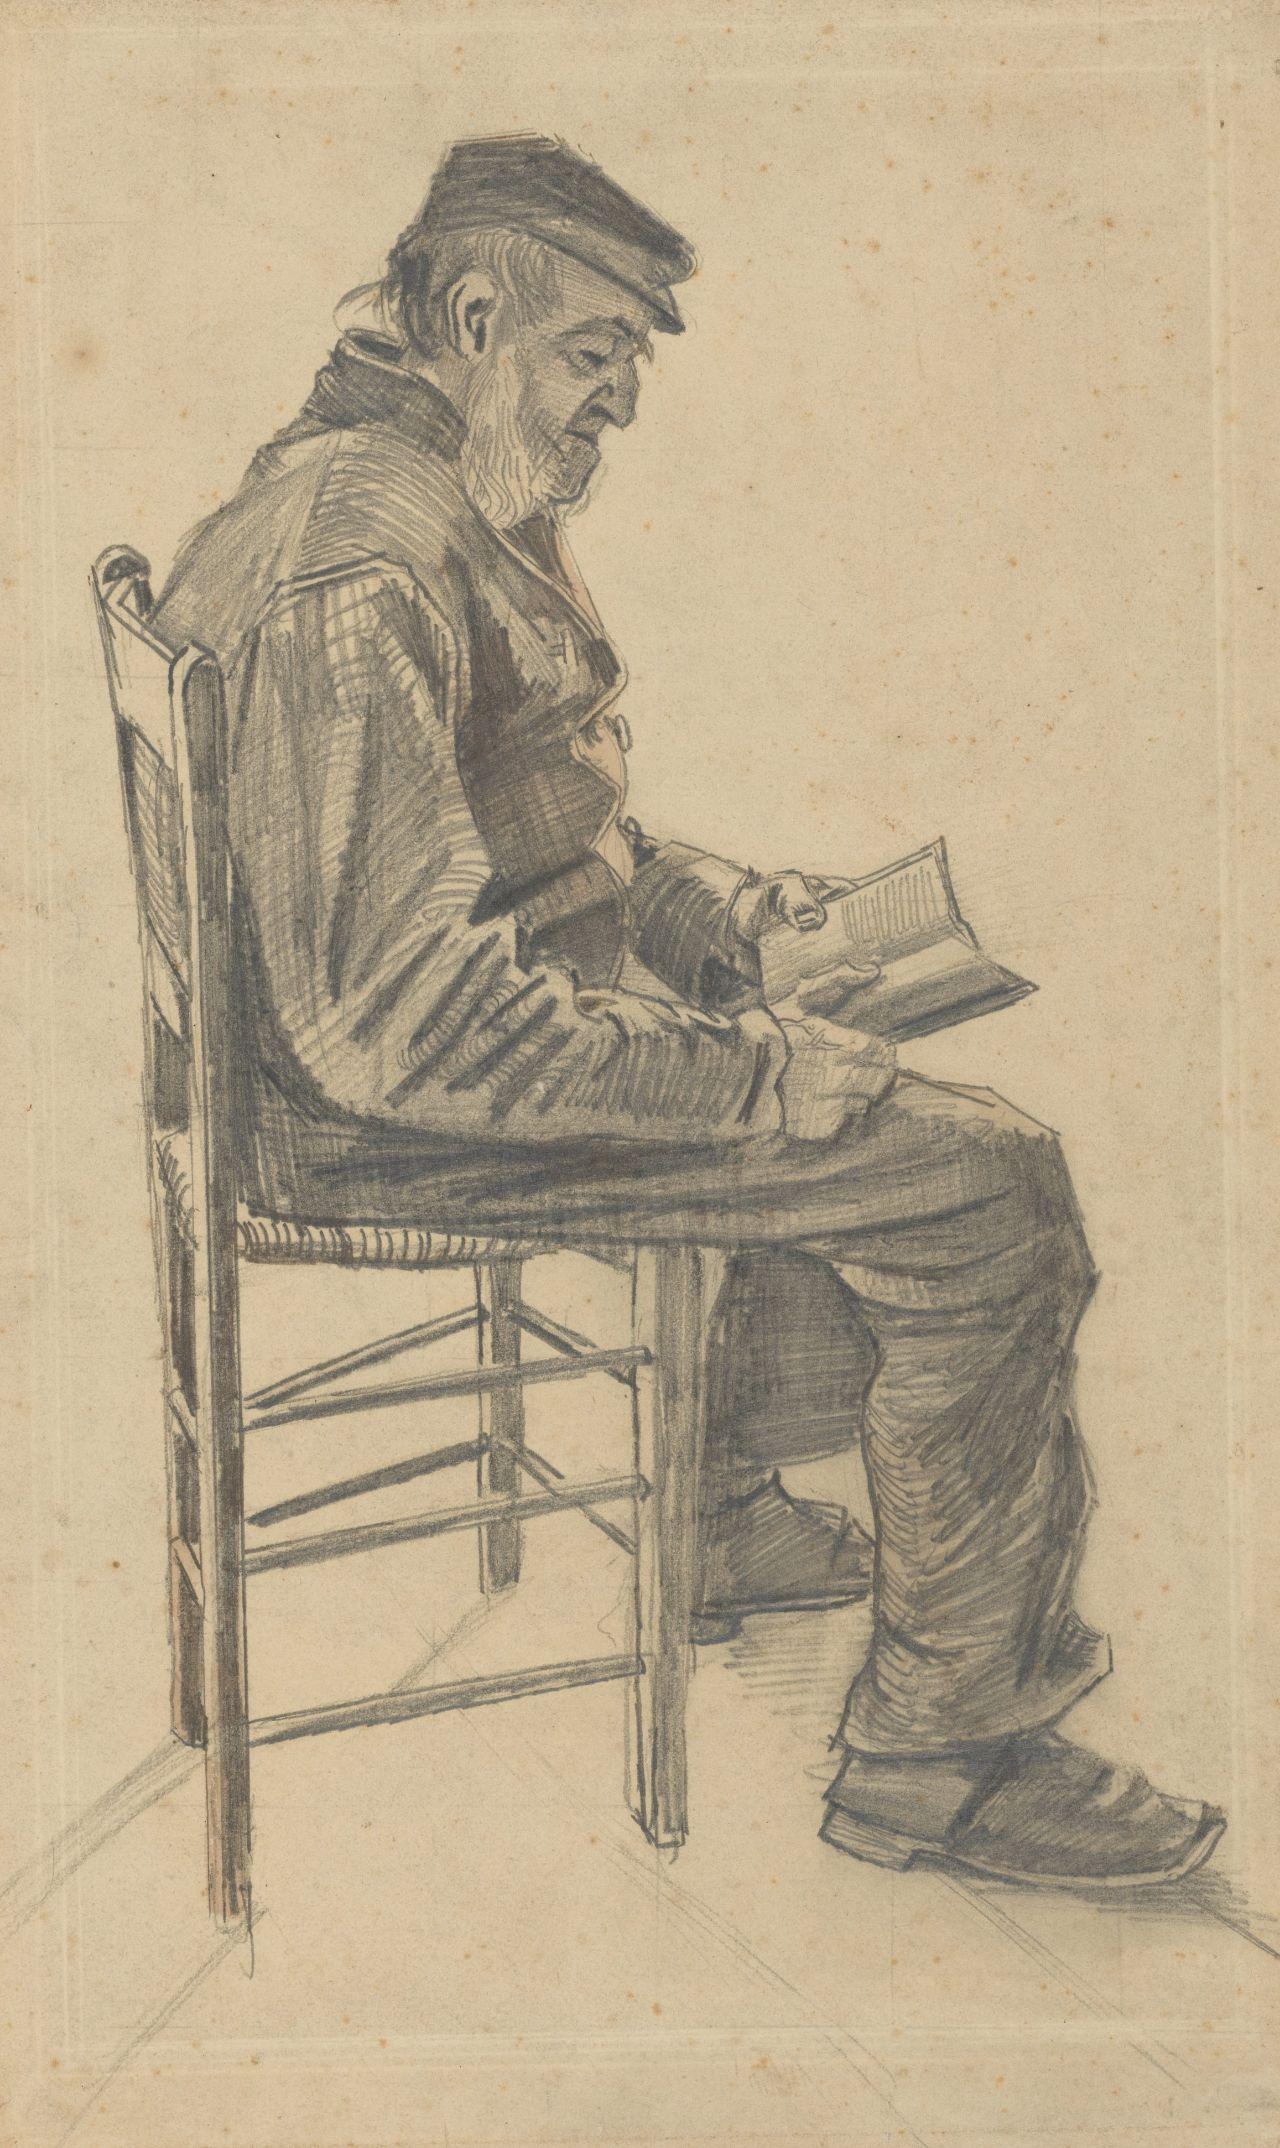 Vincent van Gogh - Old Man Reading - Van Gogh Museum